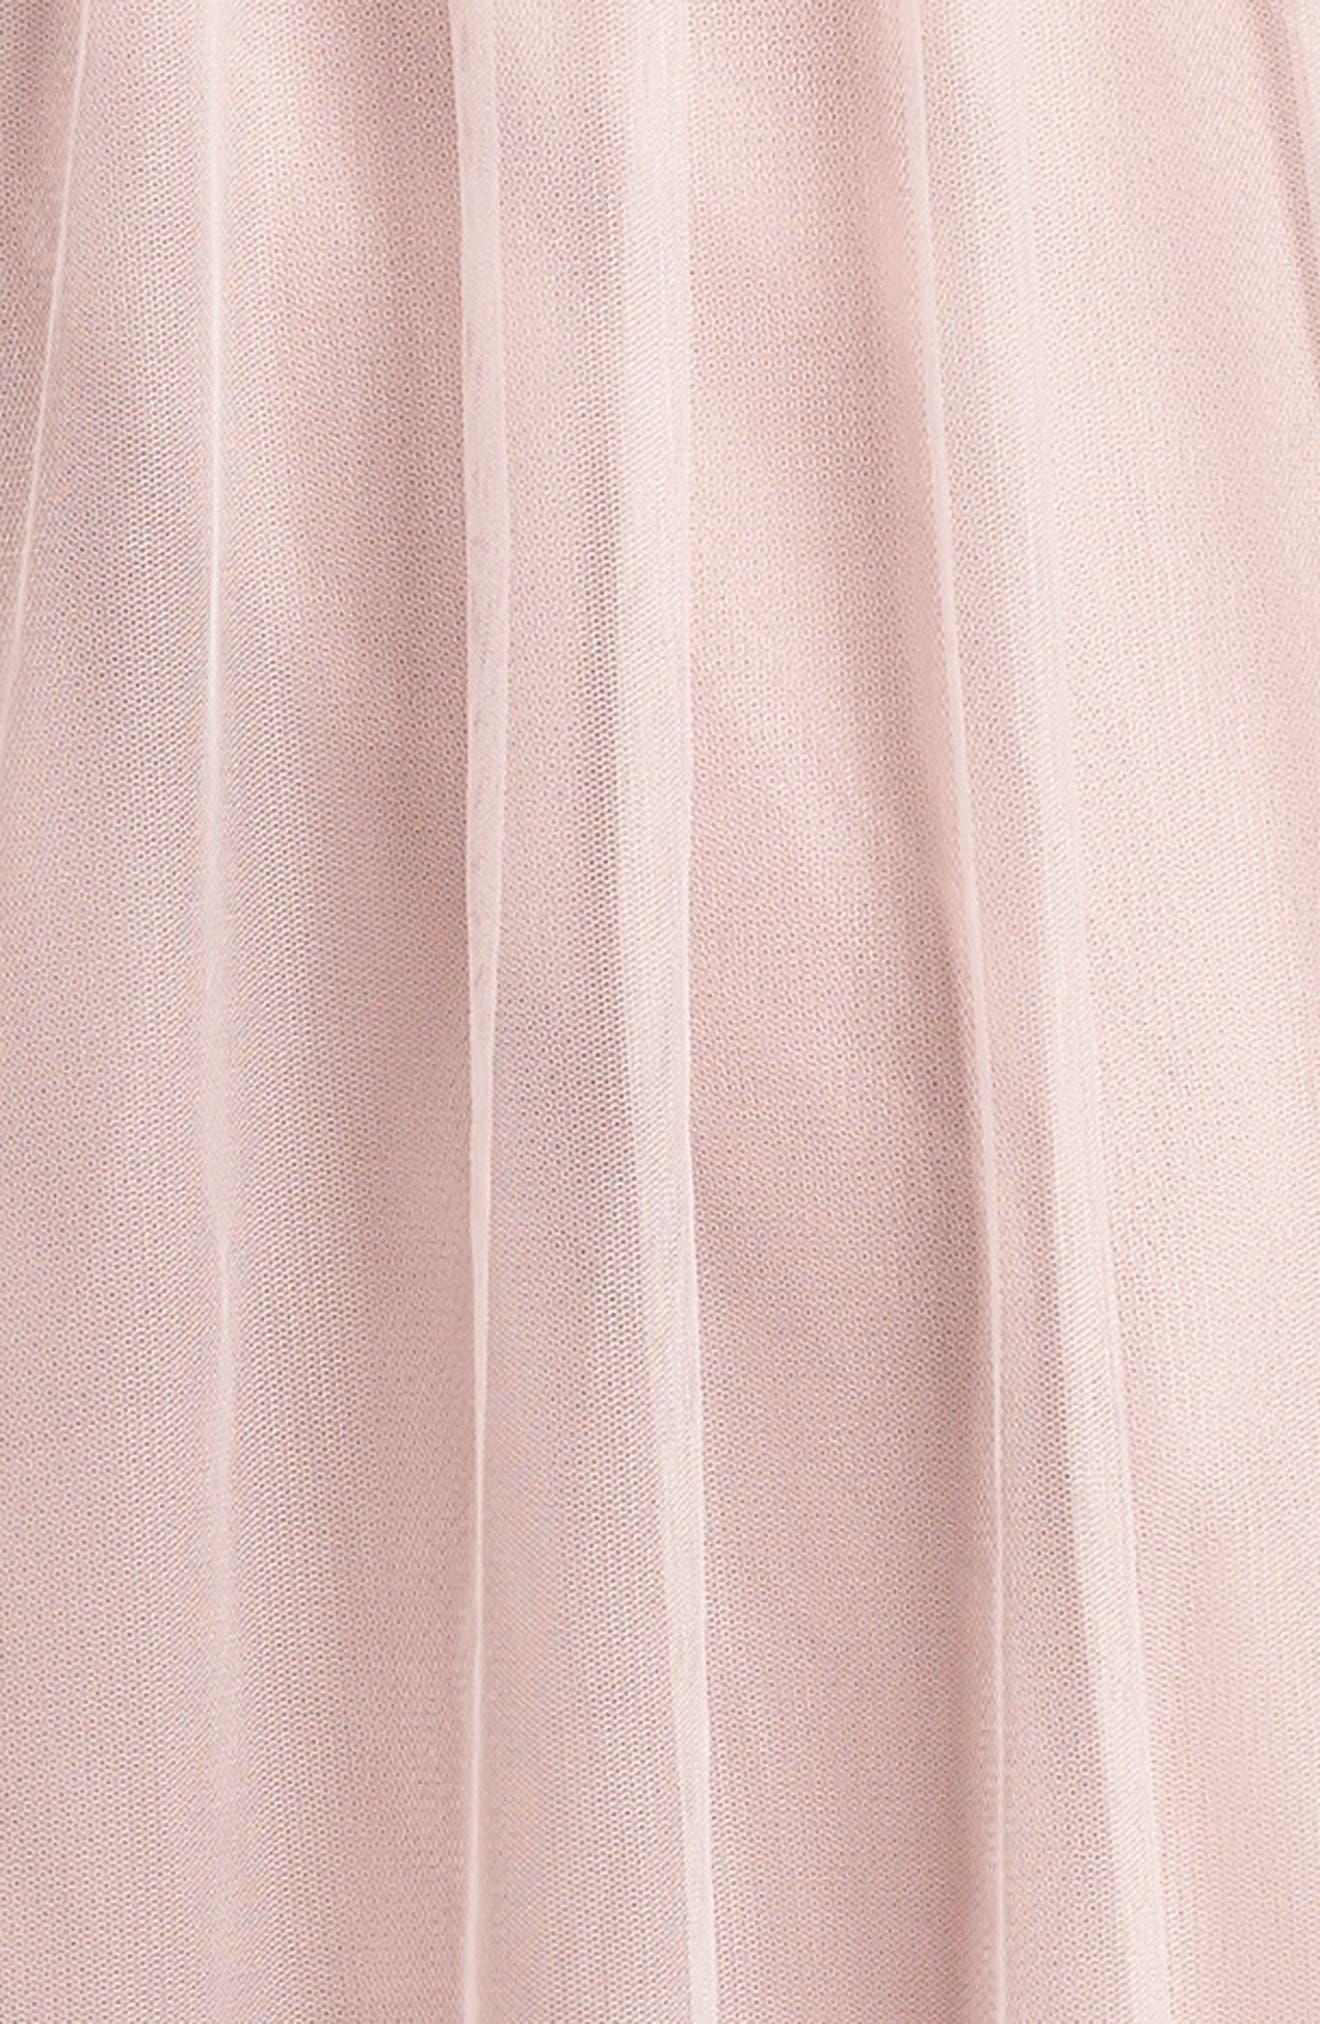 Illusion Gown,                             Alternate thumbnail 15, color,